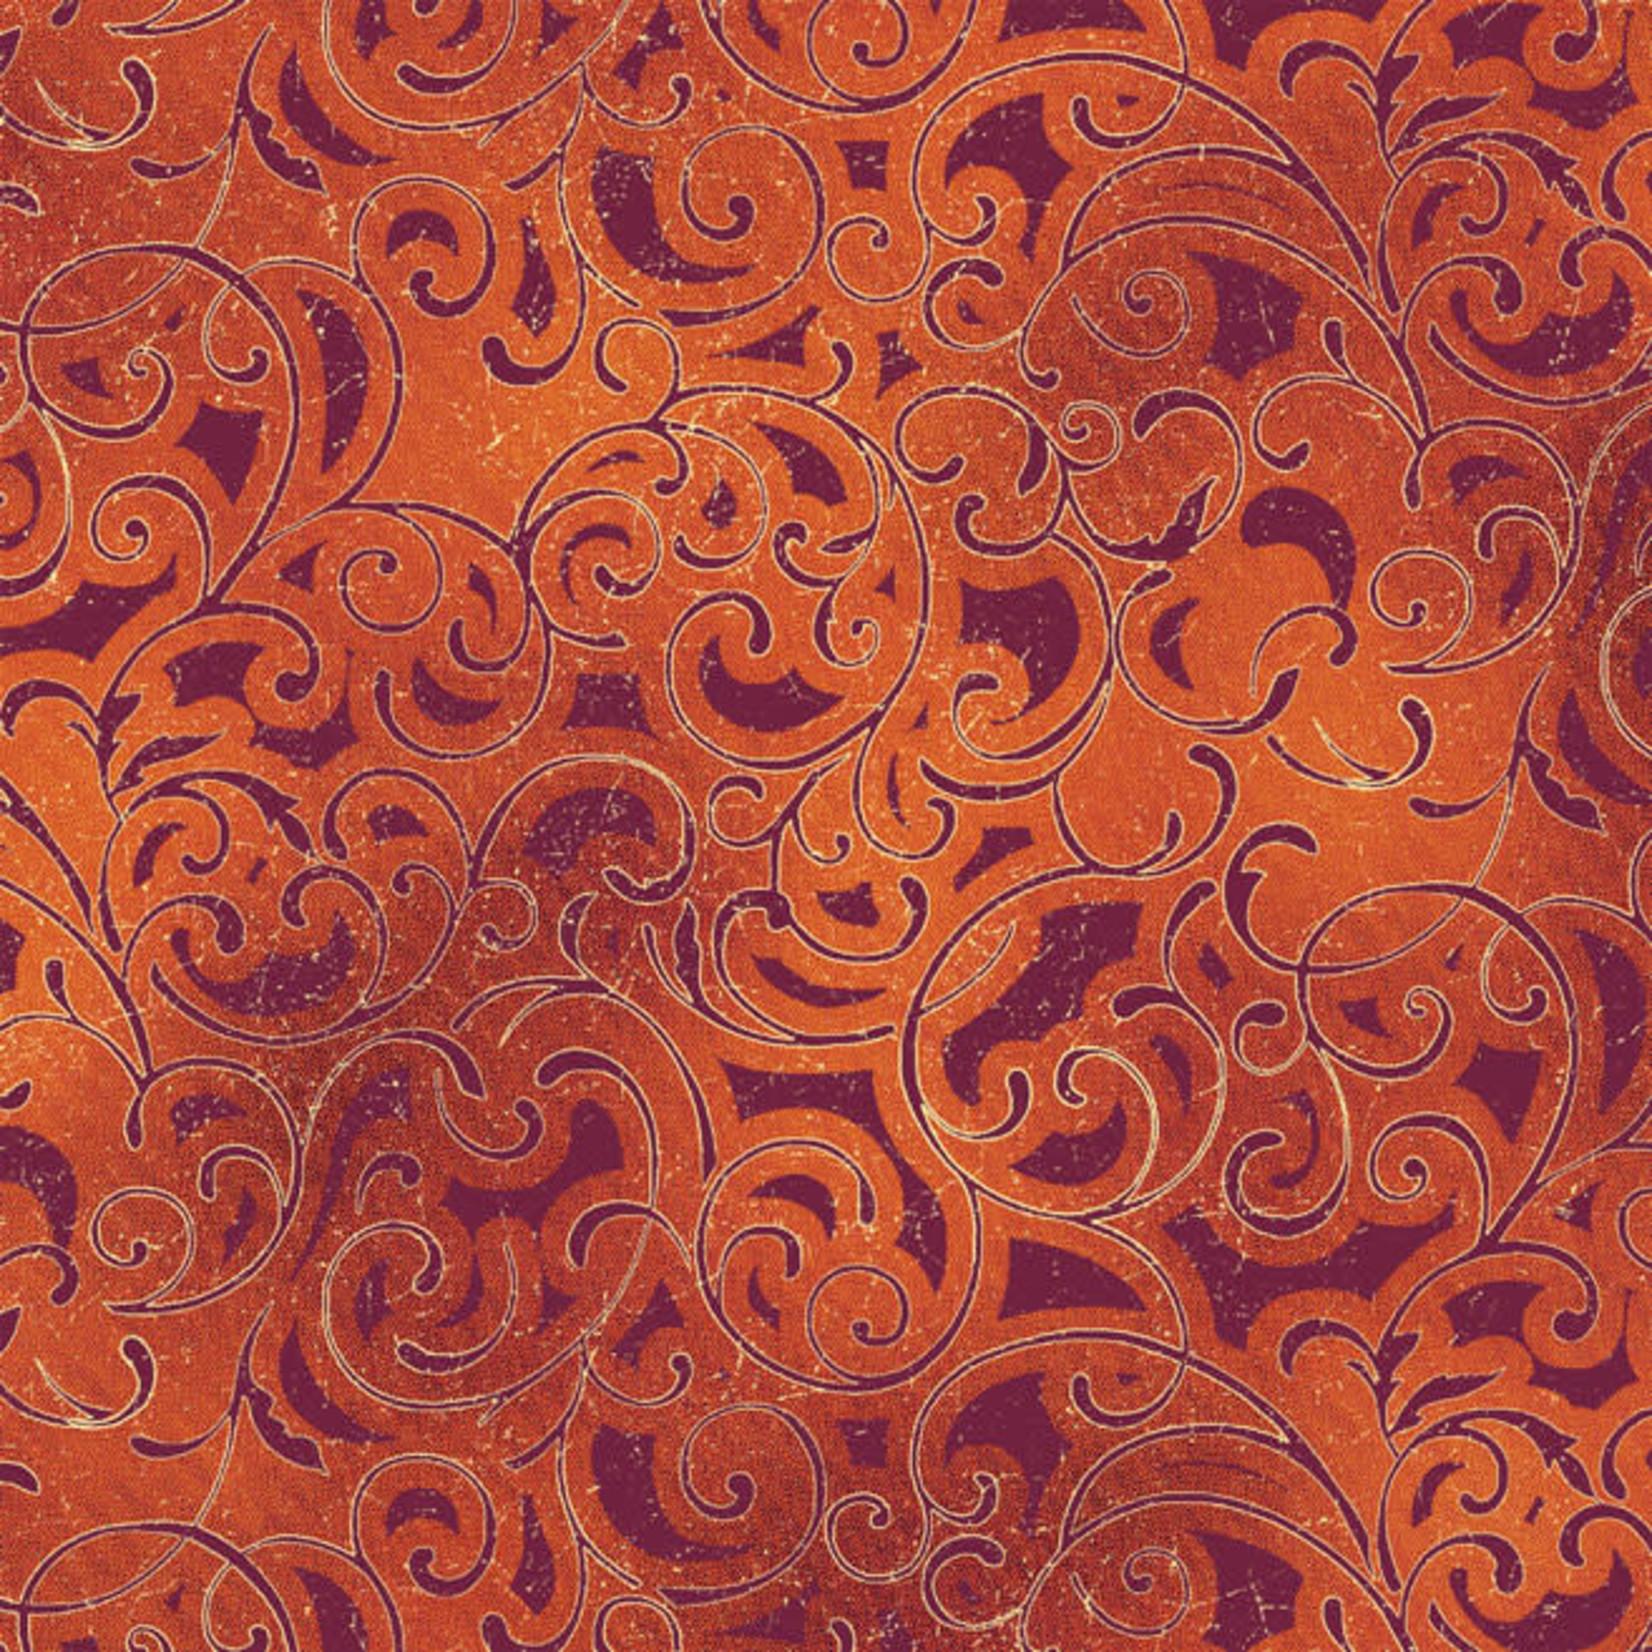 Windham Fabrics Grand Illusion - Scroll - Red